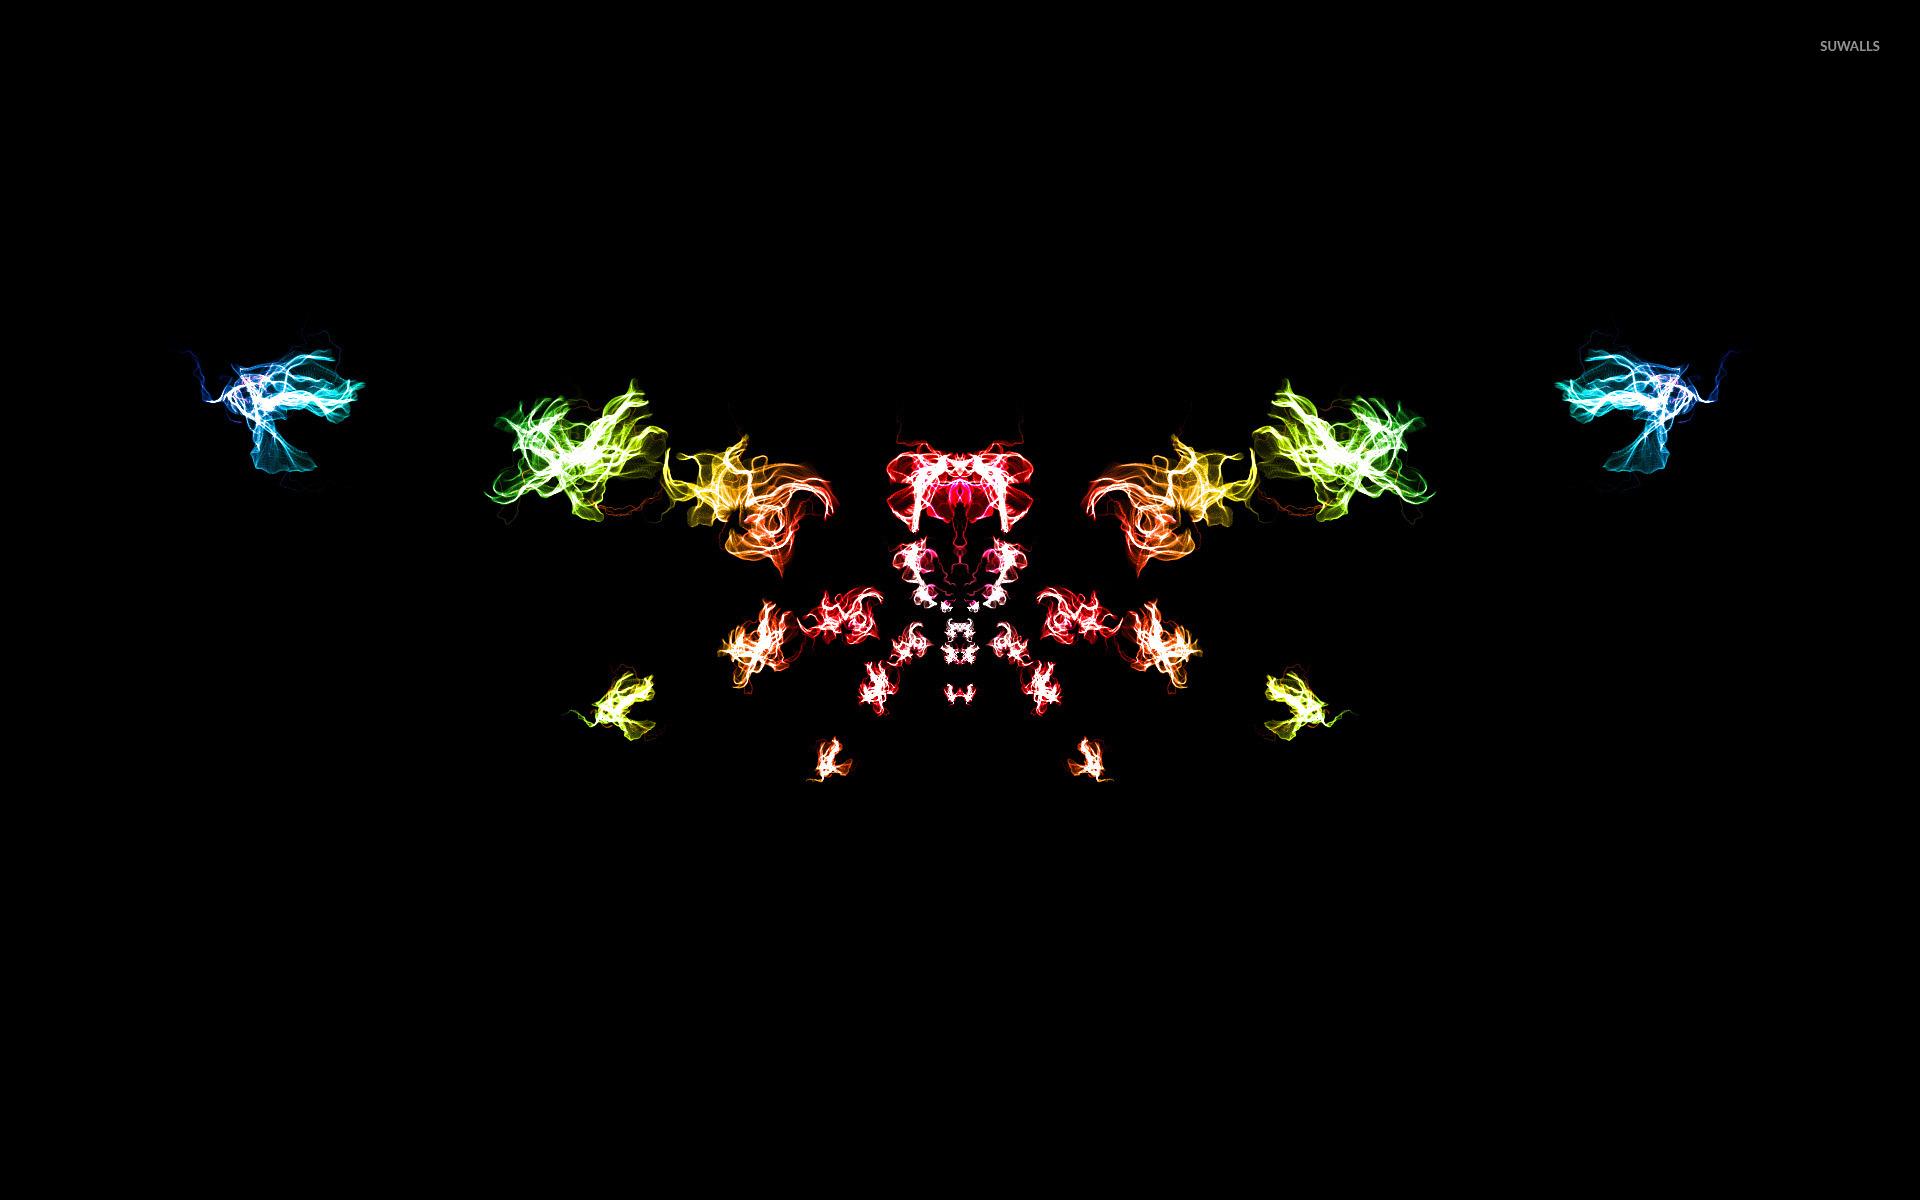 rainbow smoke wallpaper - abstract wallpapers - #31600